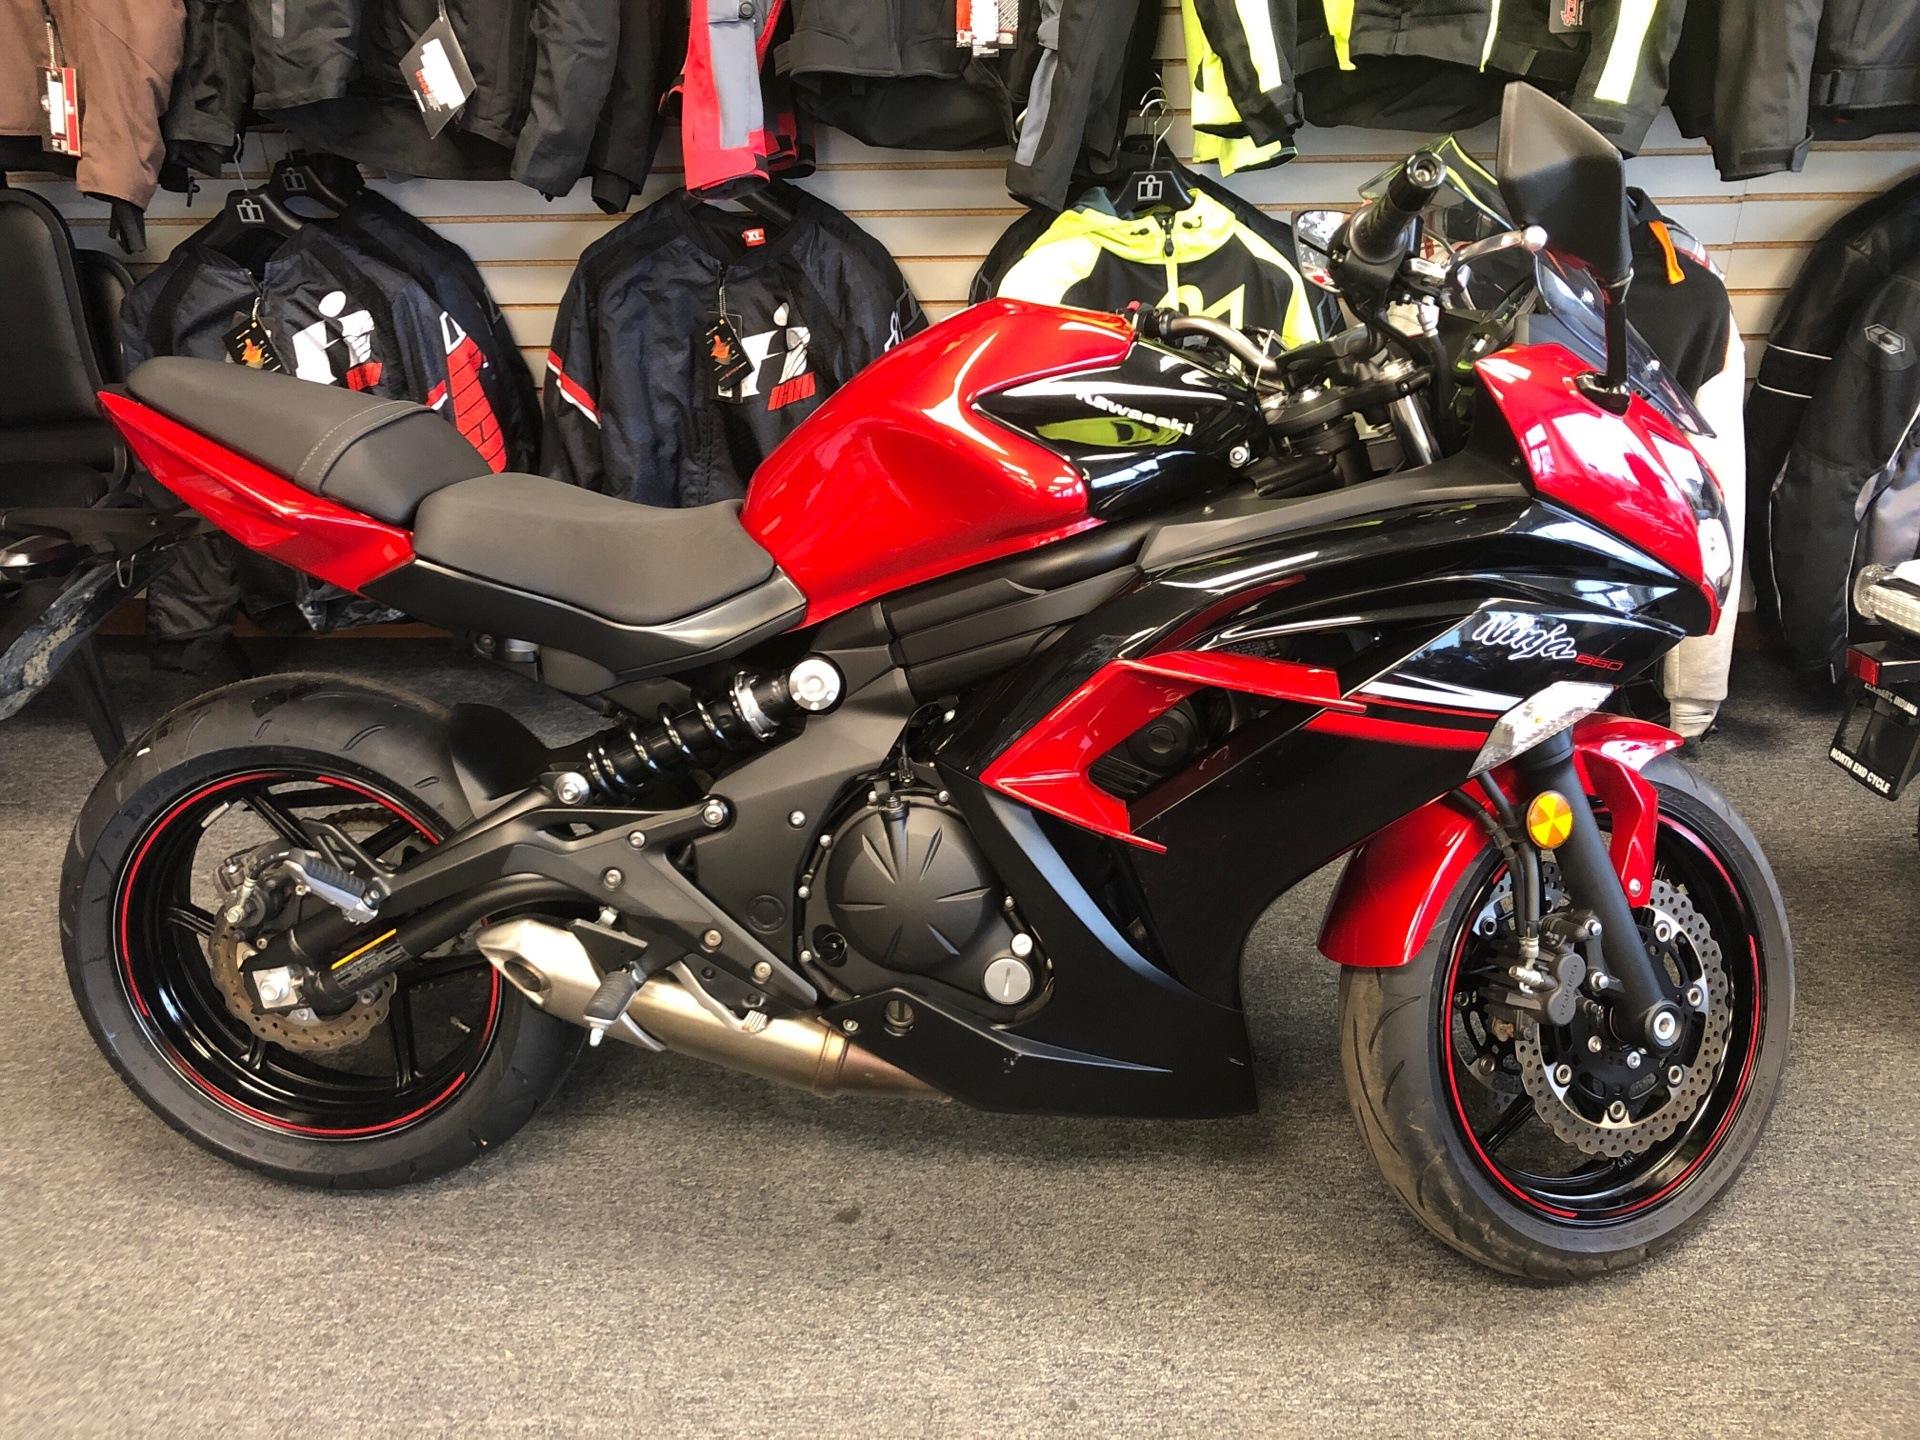 Used 2016 Kawasaki Ninja 650 Motorcycles In Elkhart In Stock